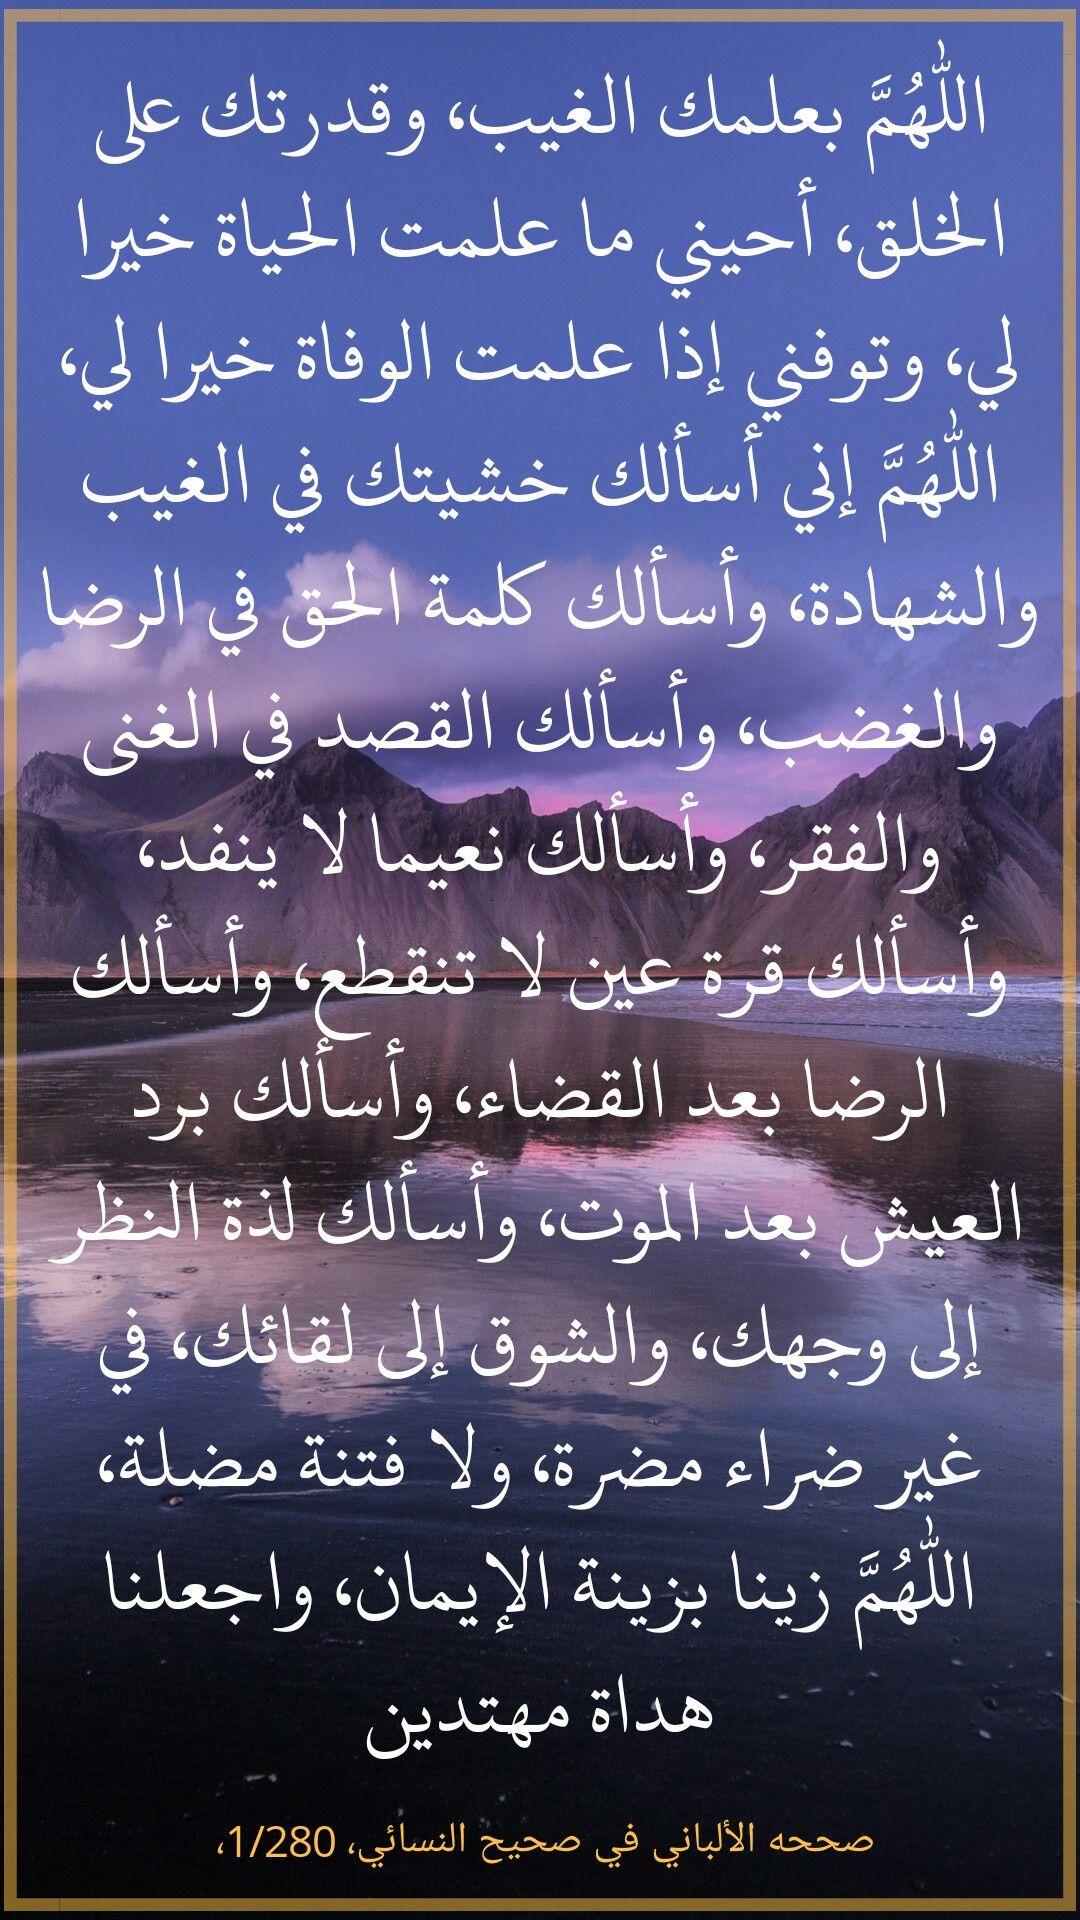 ادعيه نبويه Islamic Quotes Romantic Love Quotes Learning Websites